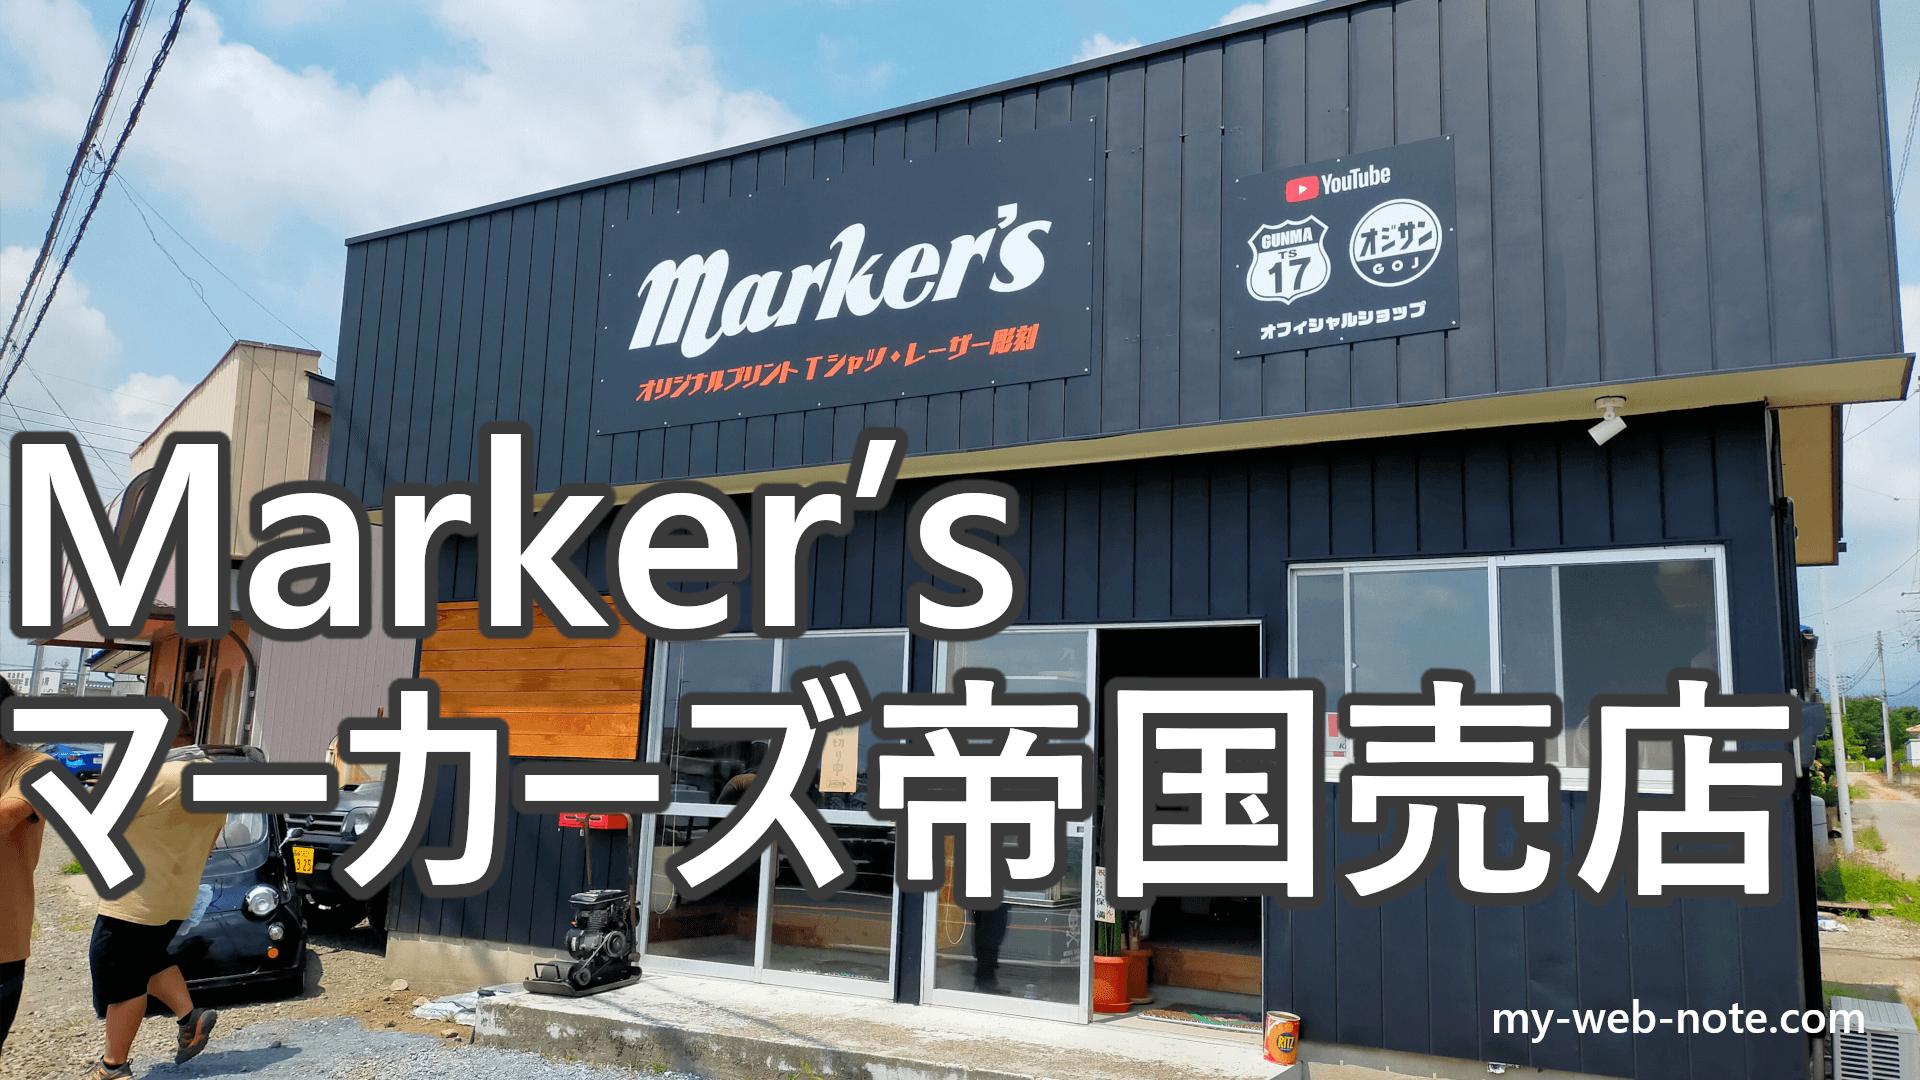 【GUNMA-17】オフィシャルショップ『Makers / マーカーズ帝国売店』に行ってきた【オジサンの休日】